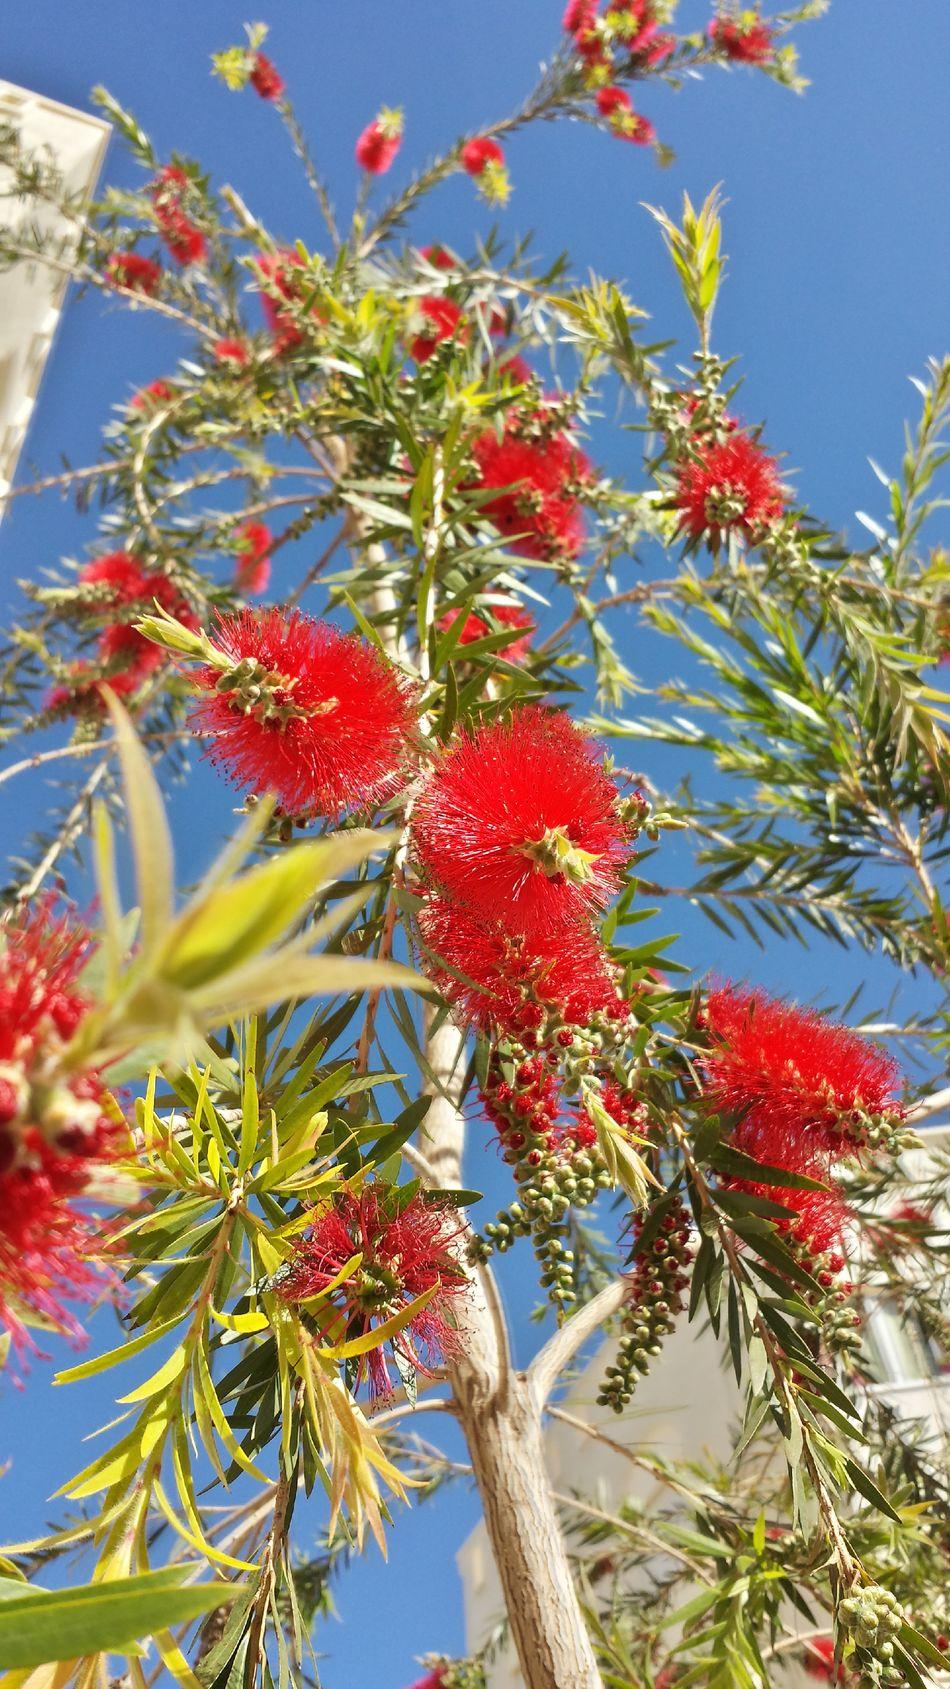 سبحانك ربي الحمد_لله Tree Growth Sky Nature Red Beauty In Nature Flower Nature Beautiful Oujda City, Morocco The Purist (no Edit, No Filter) Morocco Hugging A Tree